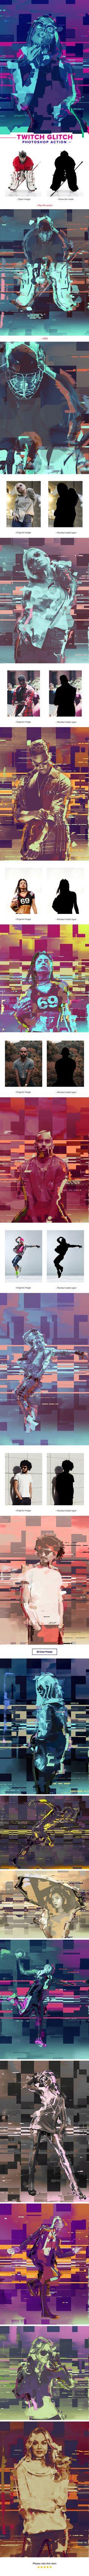 Twitch Glitch Photoshop Action  #tv #grunge • Download ➝ https://graphicriver.net/item/twitch-glitch-photoshop-action/21247024?ref=pxcr